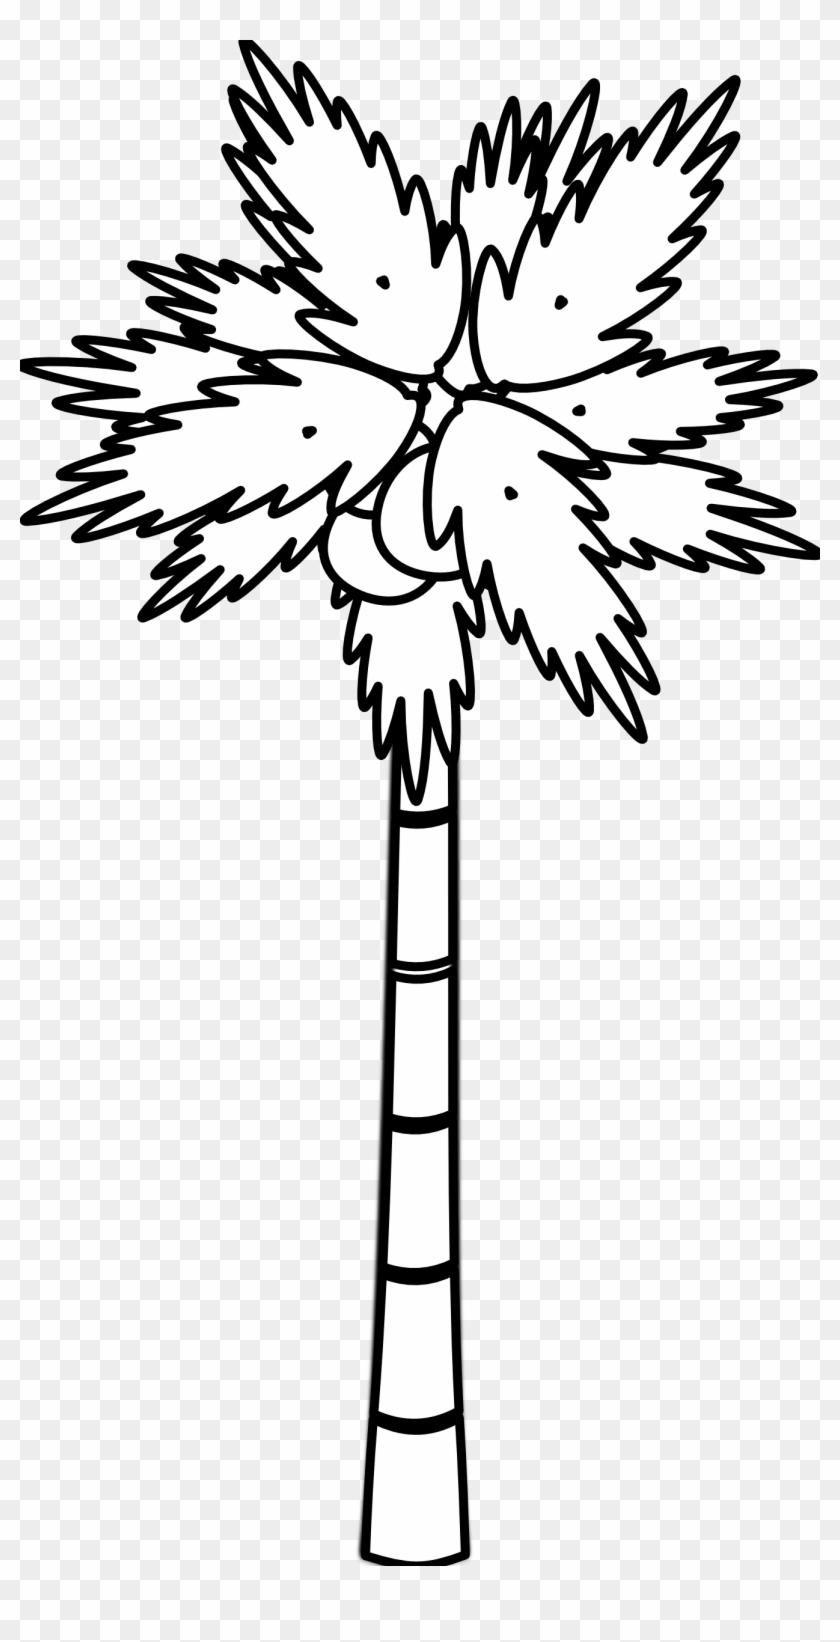 Palm Tree Clip Art Black And White - Palm Tree Clip Art Black And White #348